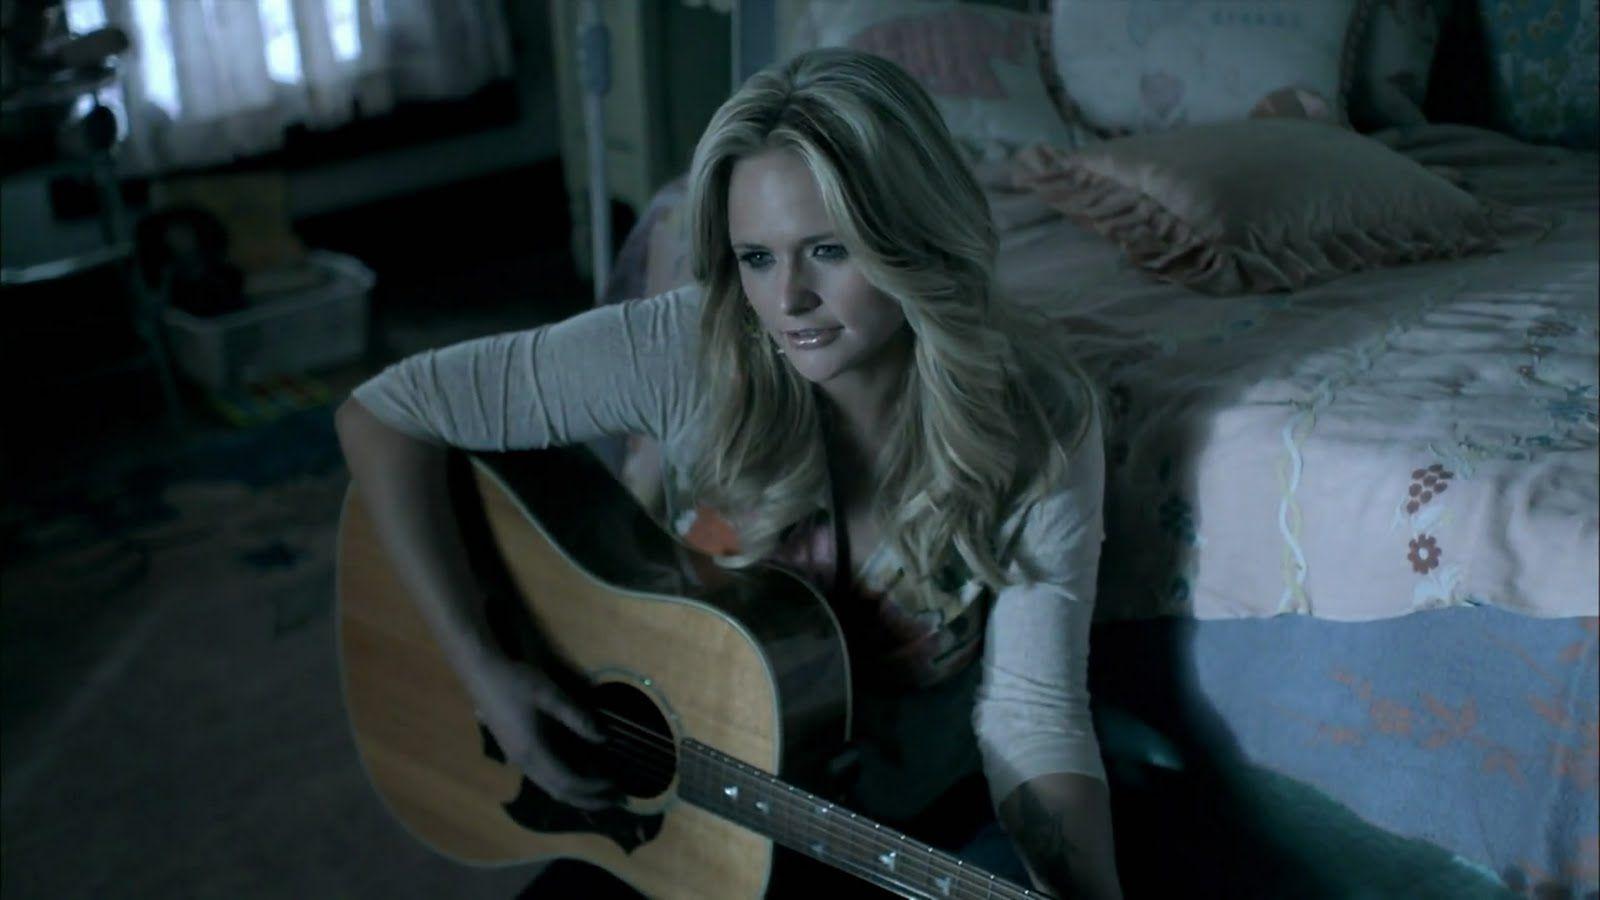 Miranda lambert the house that built me guitar chords guitar miranda lambert the house that built me guitar chords hexwebz Gallery